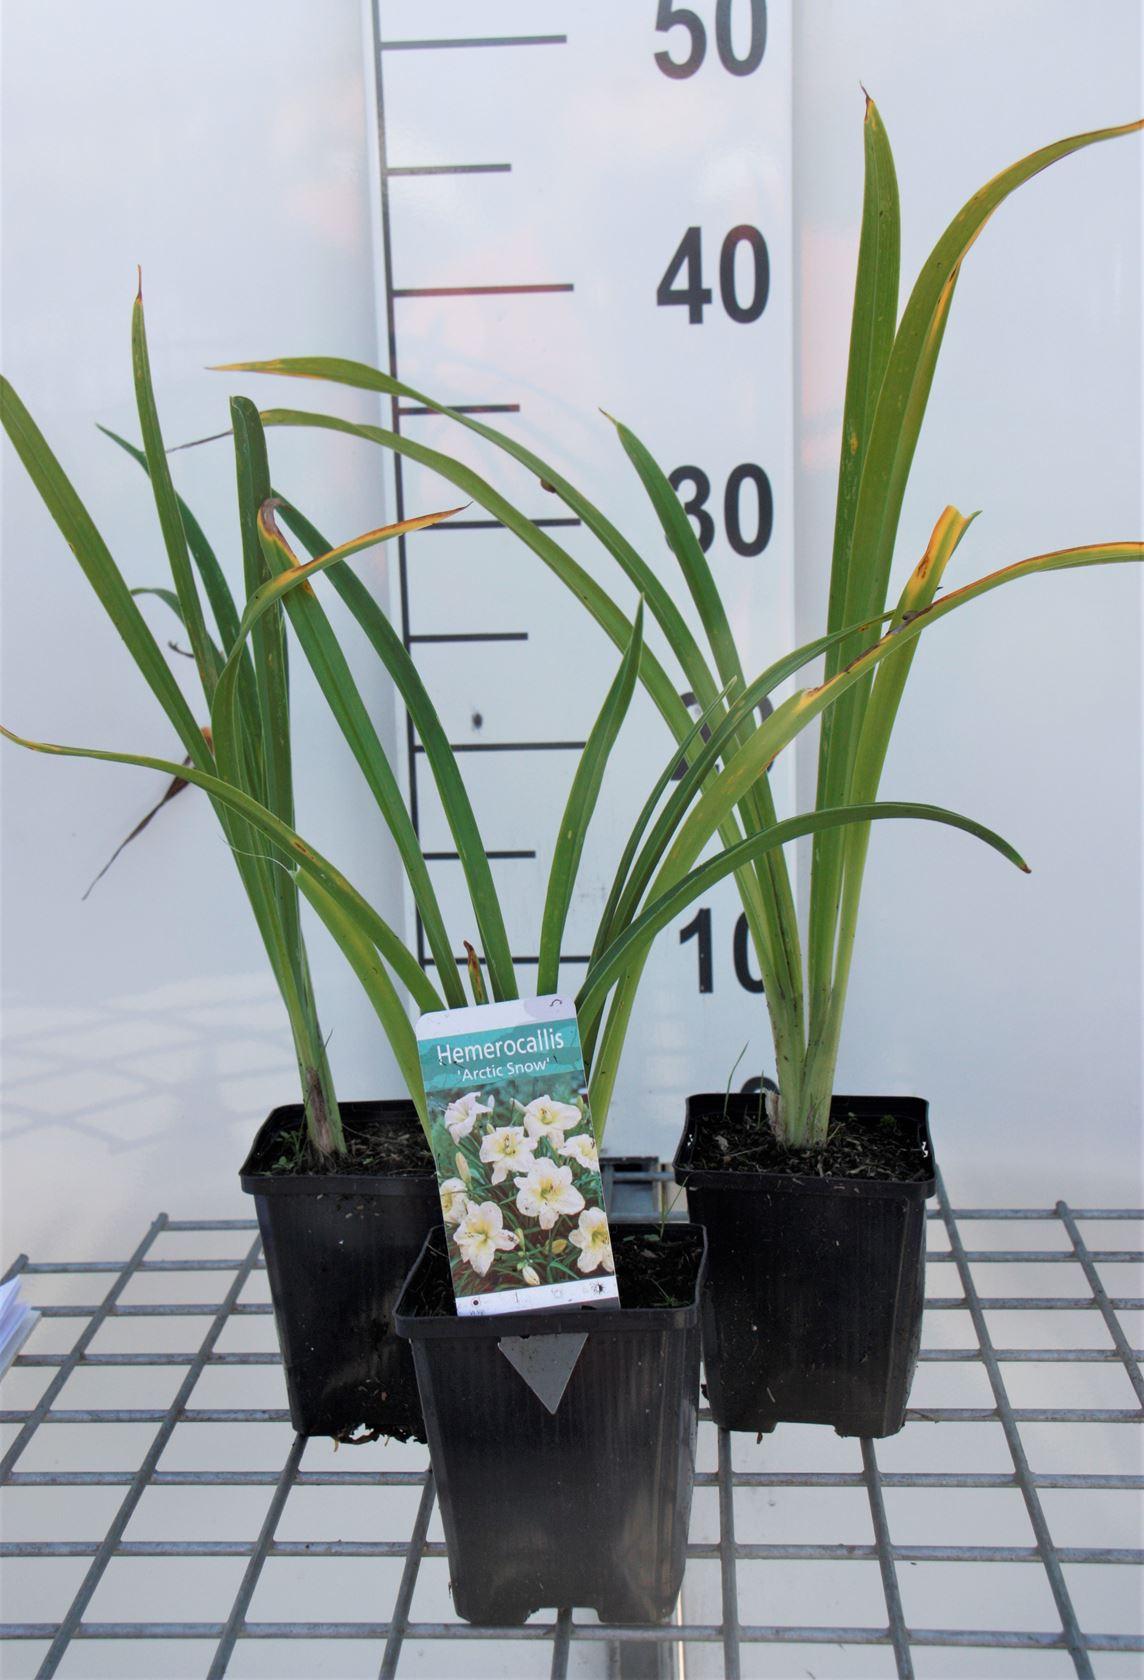 Hemerocallis 'Arctic Snow' P9 cm